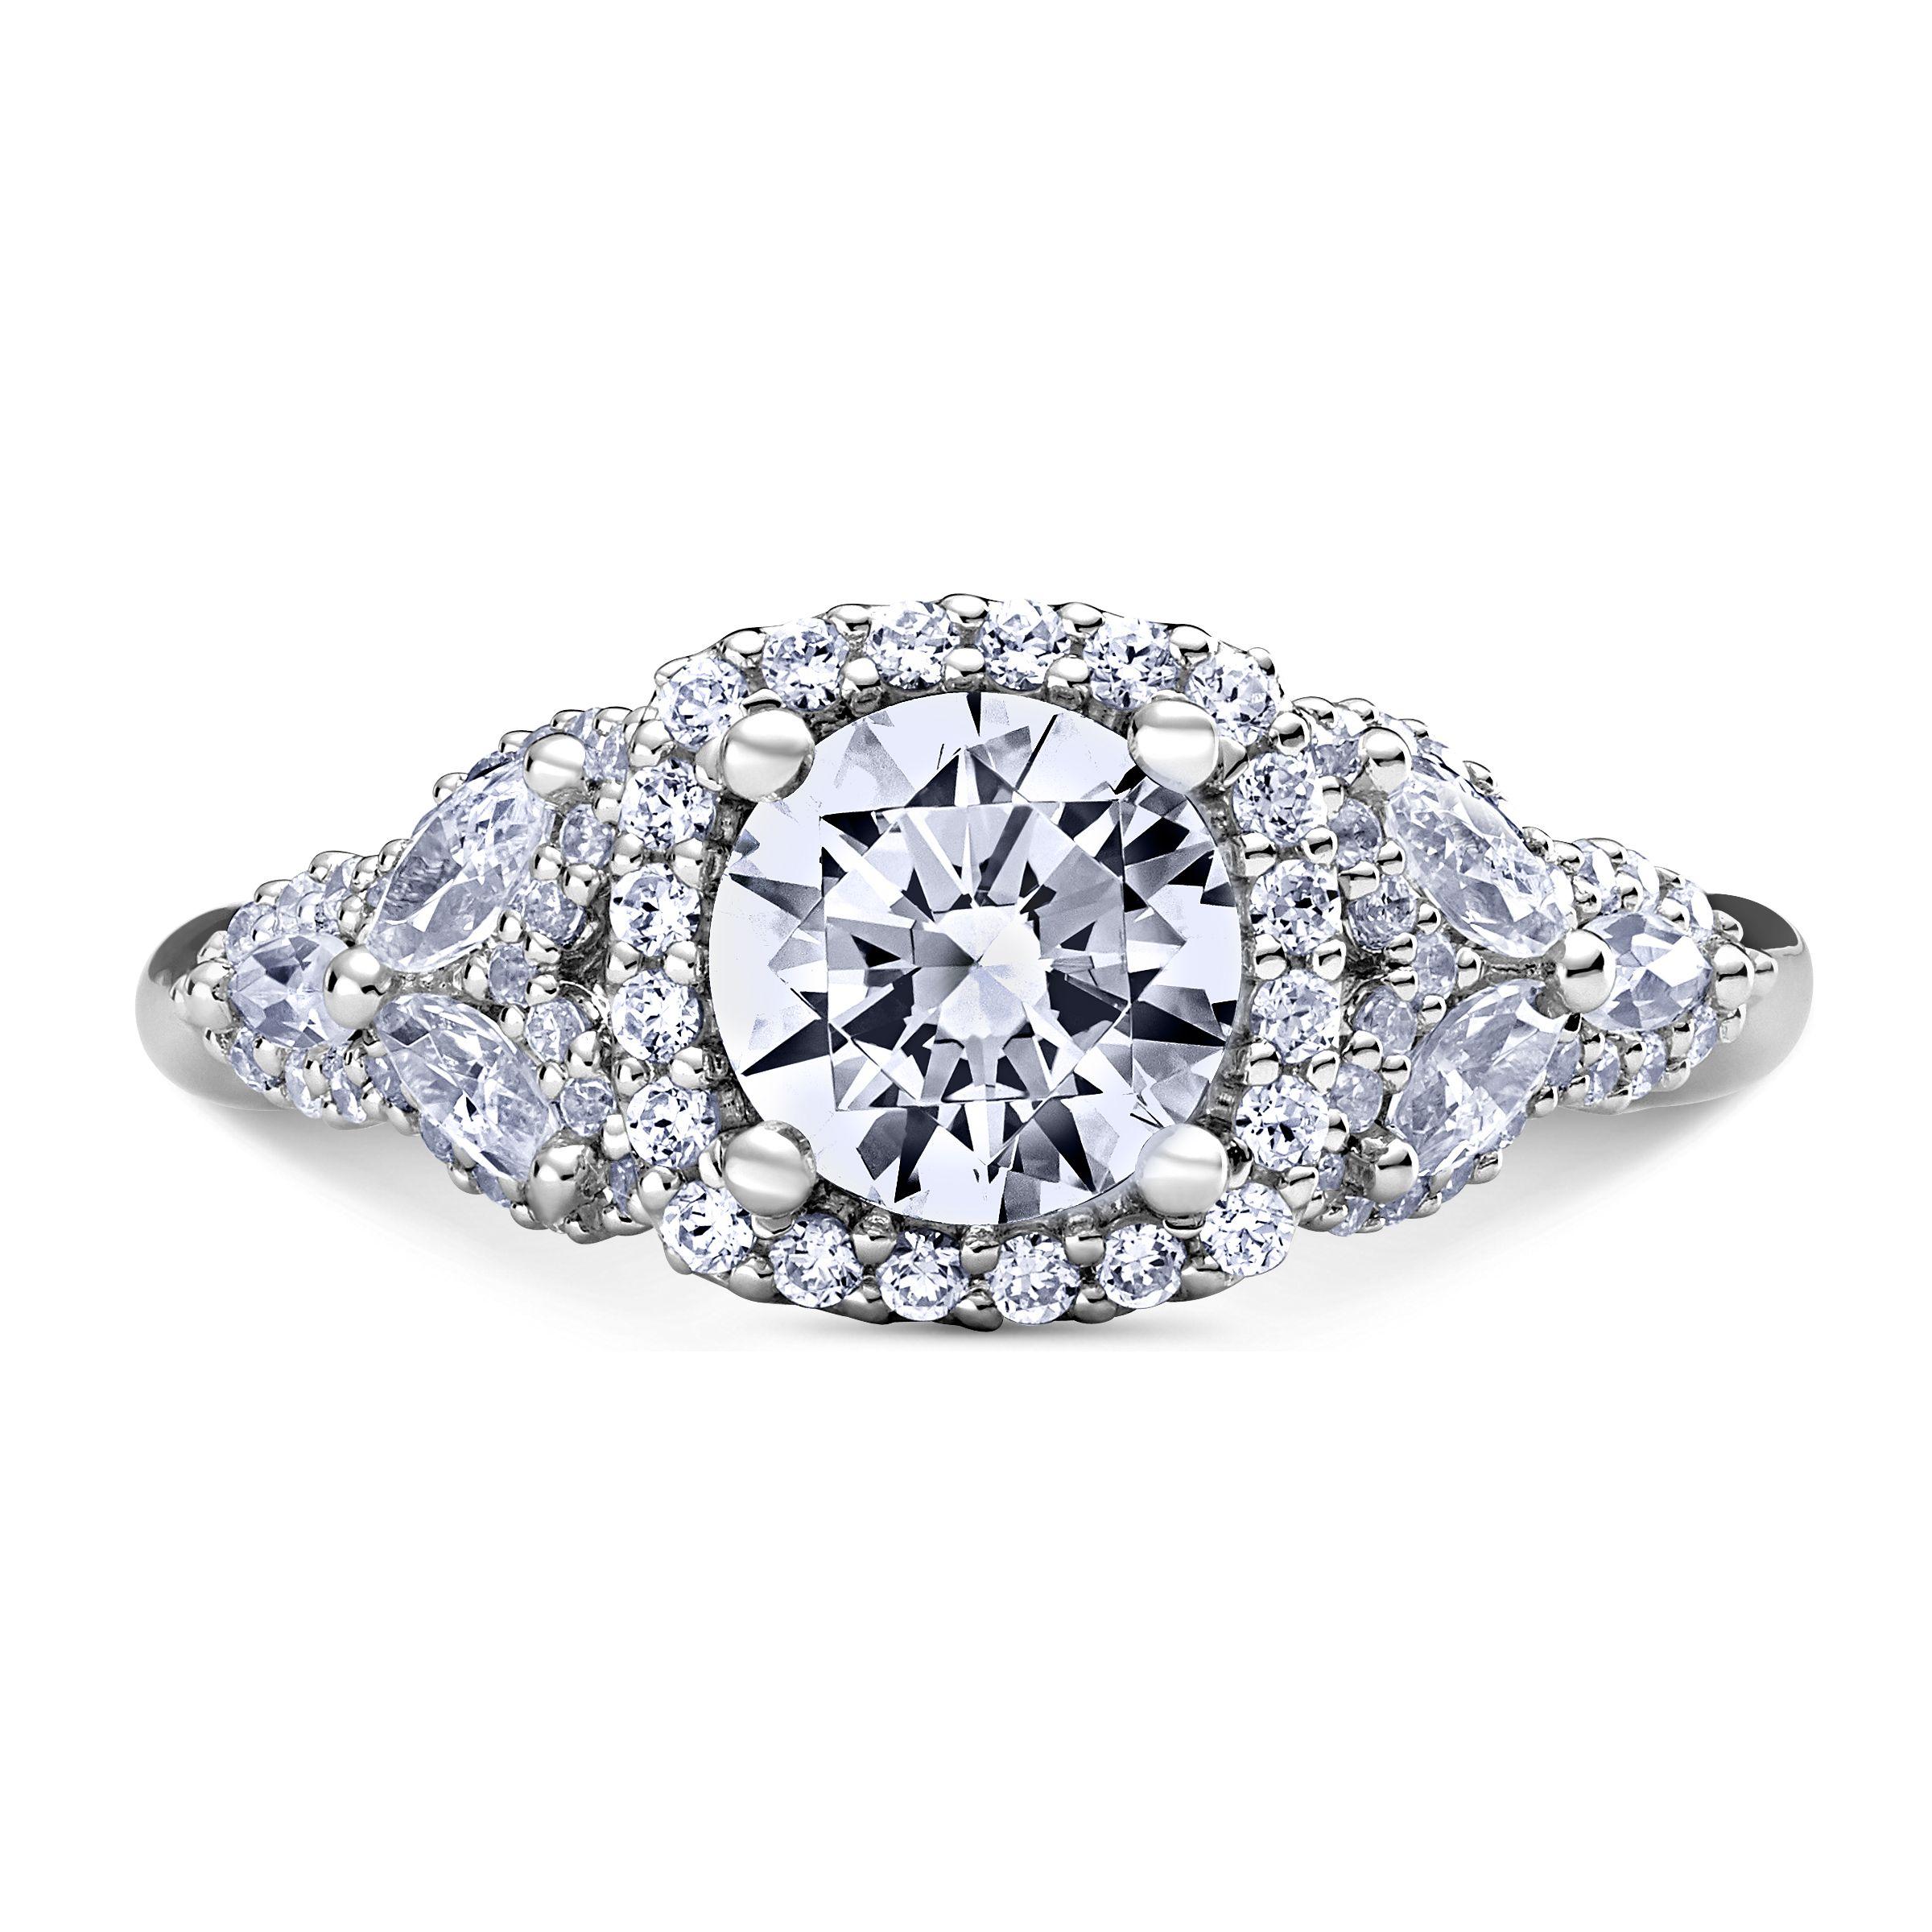 28++ Jewelry stores in celina ohio information